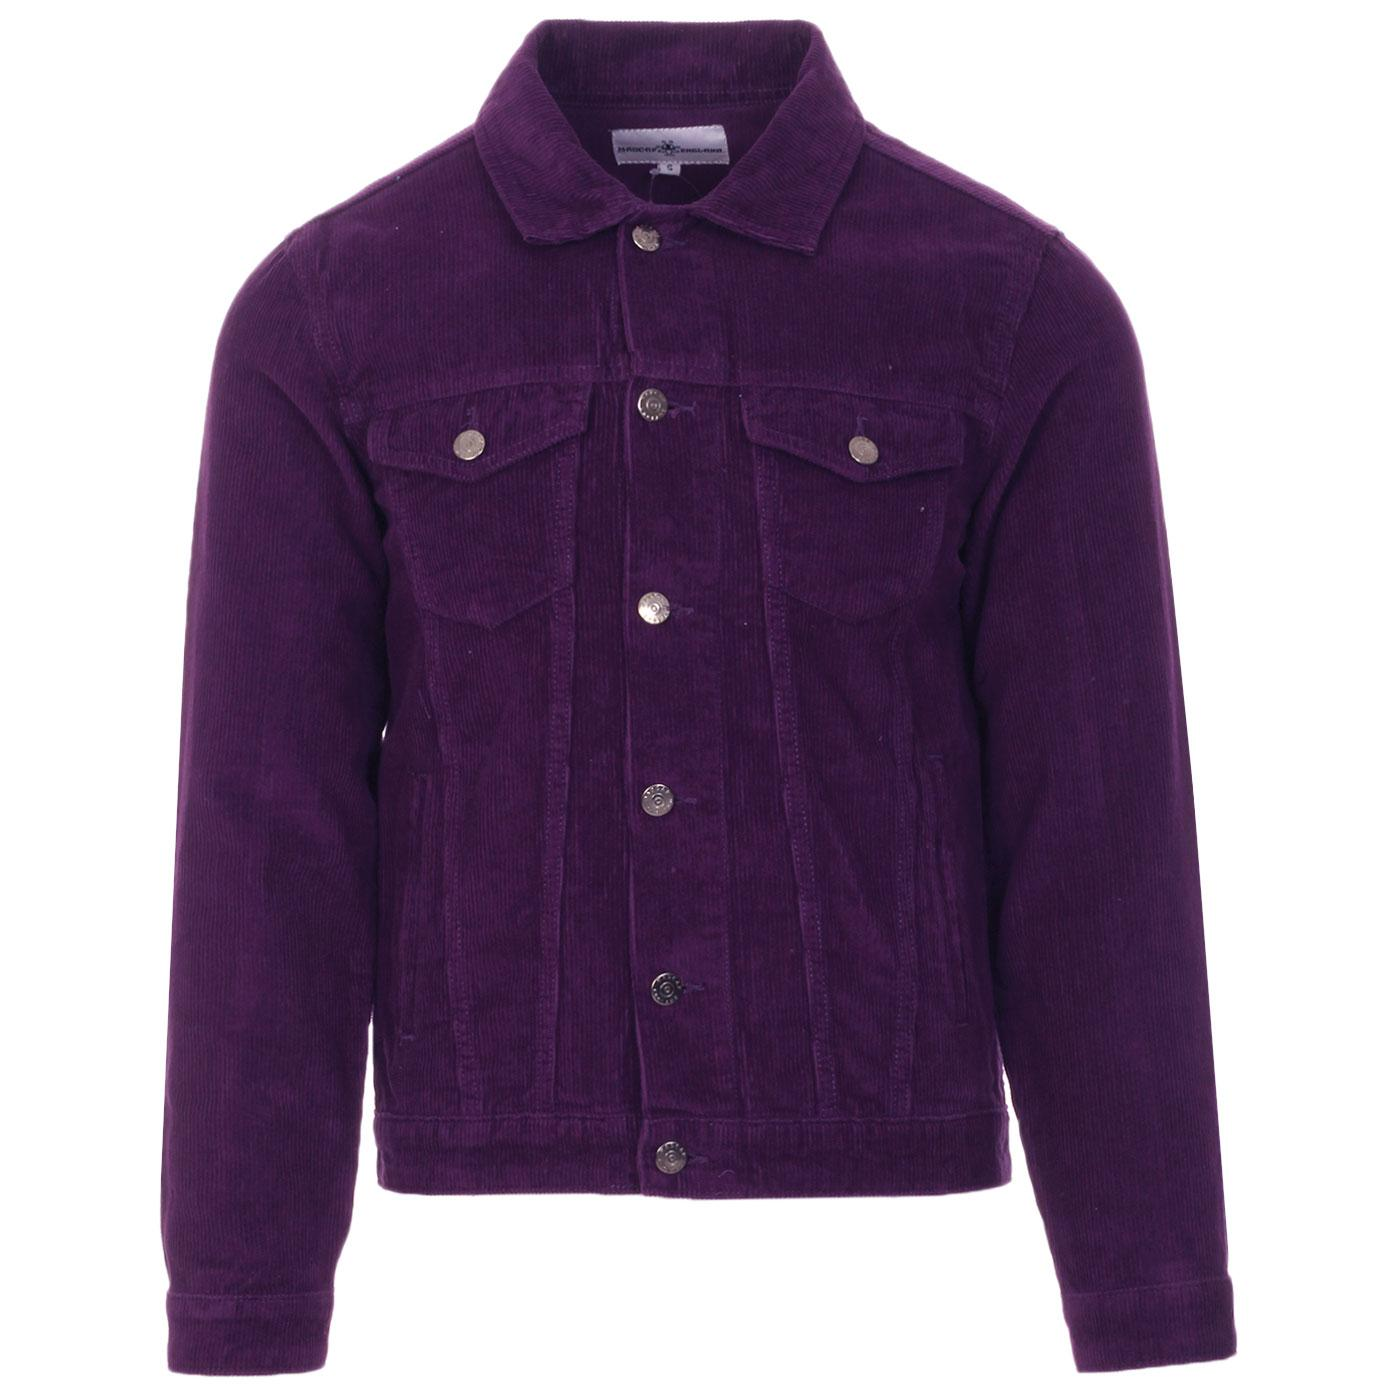 Madcap England Woburn Retro Mod Cord Western Trucker jacket in Imperial Purple